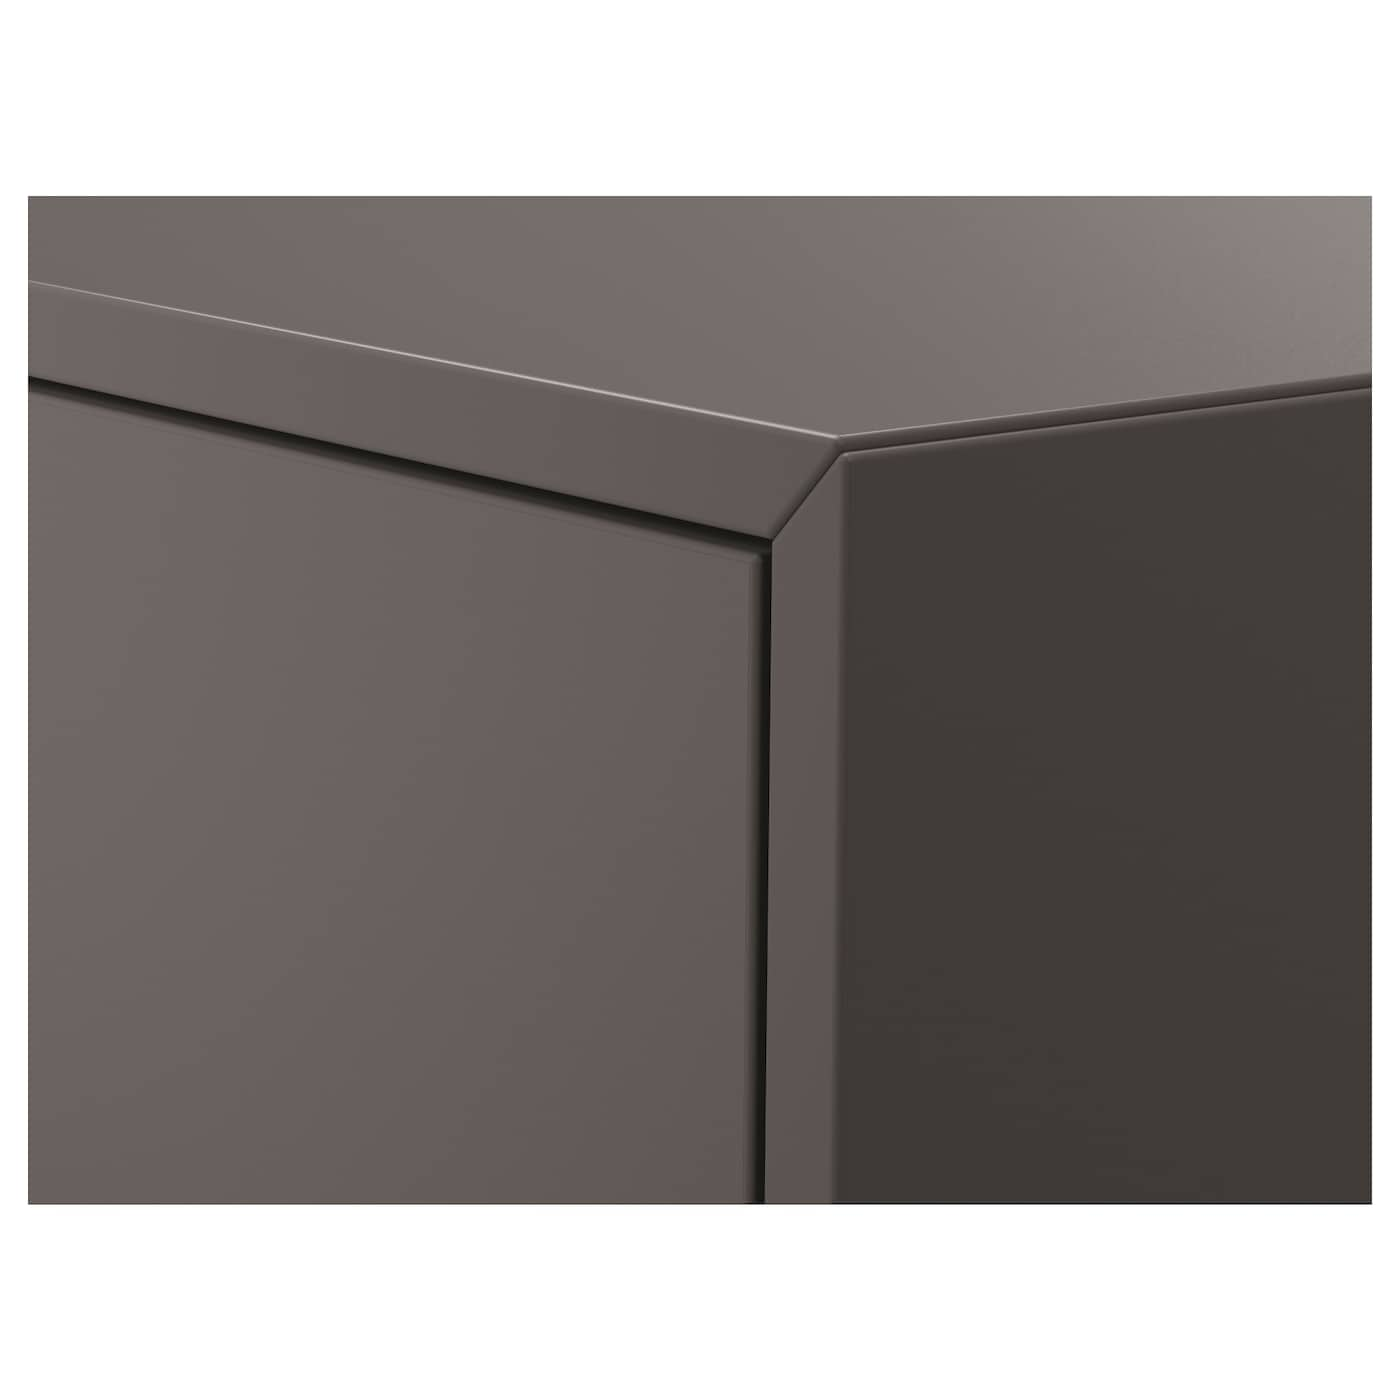 EKET خزانة مع باب, رمادي غامق, 35x35x35 سم